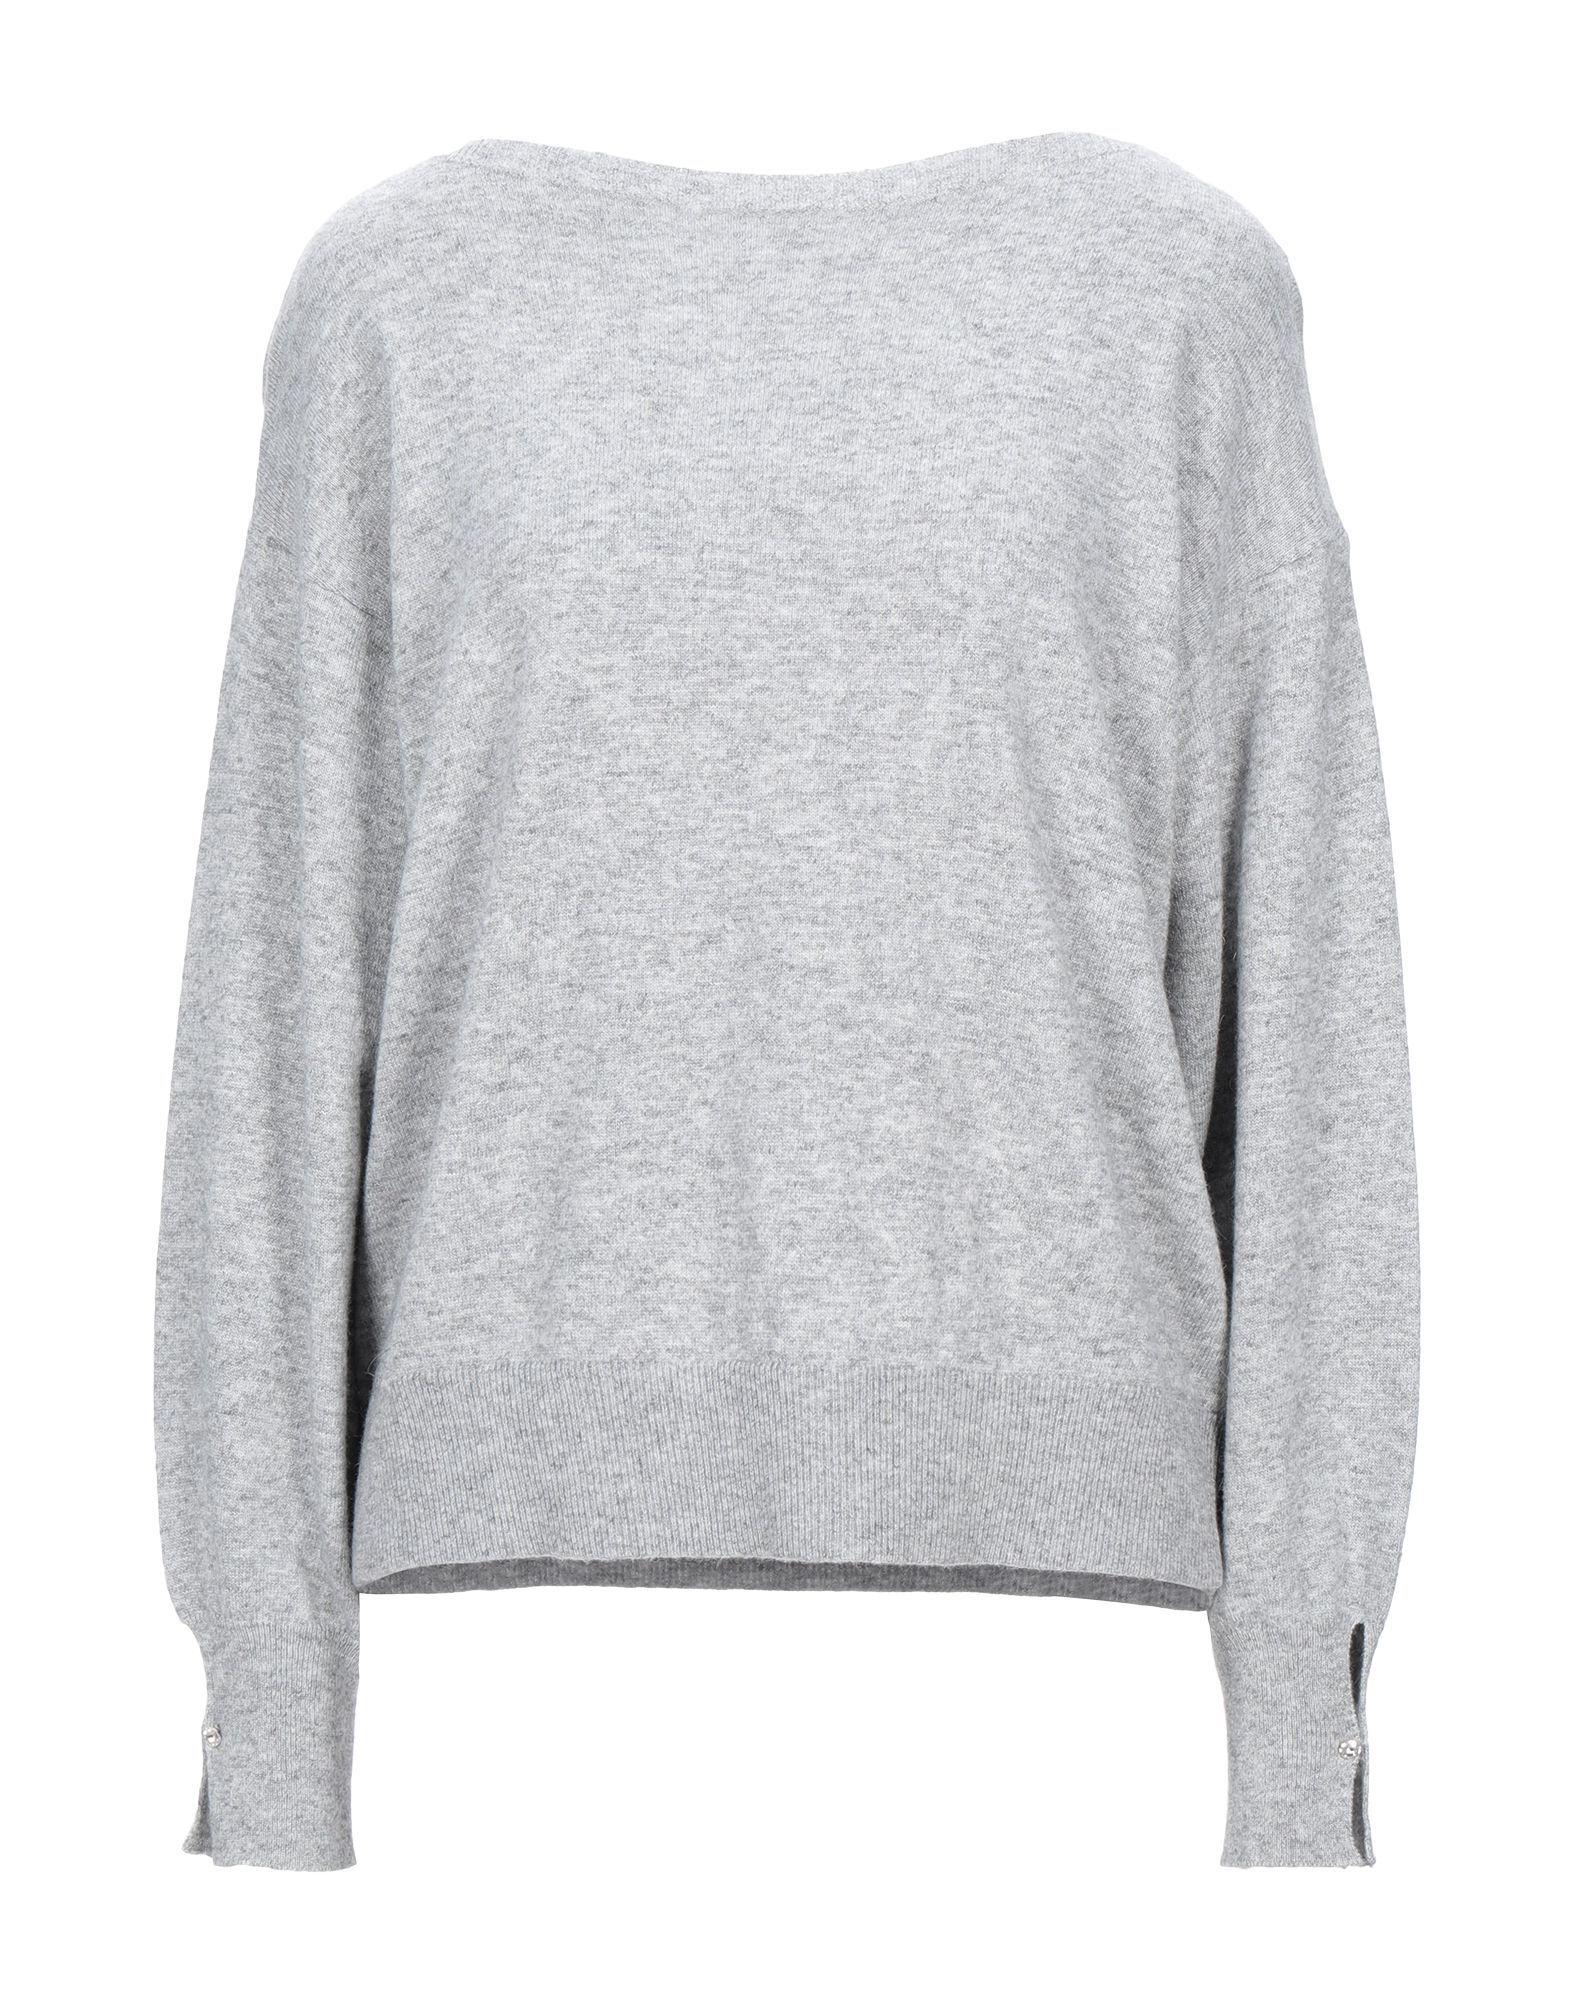 Kaos Light Grey Knit Jumper